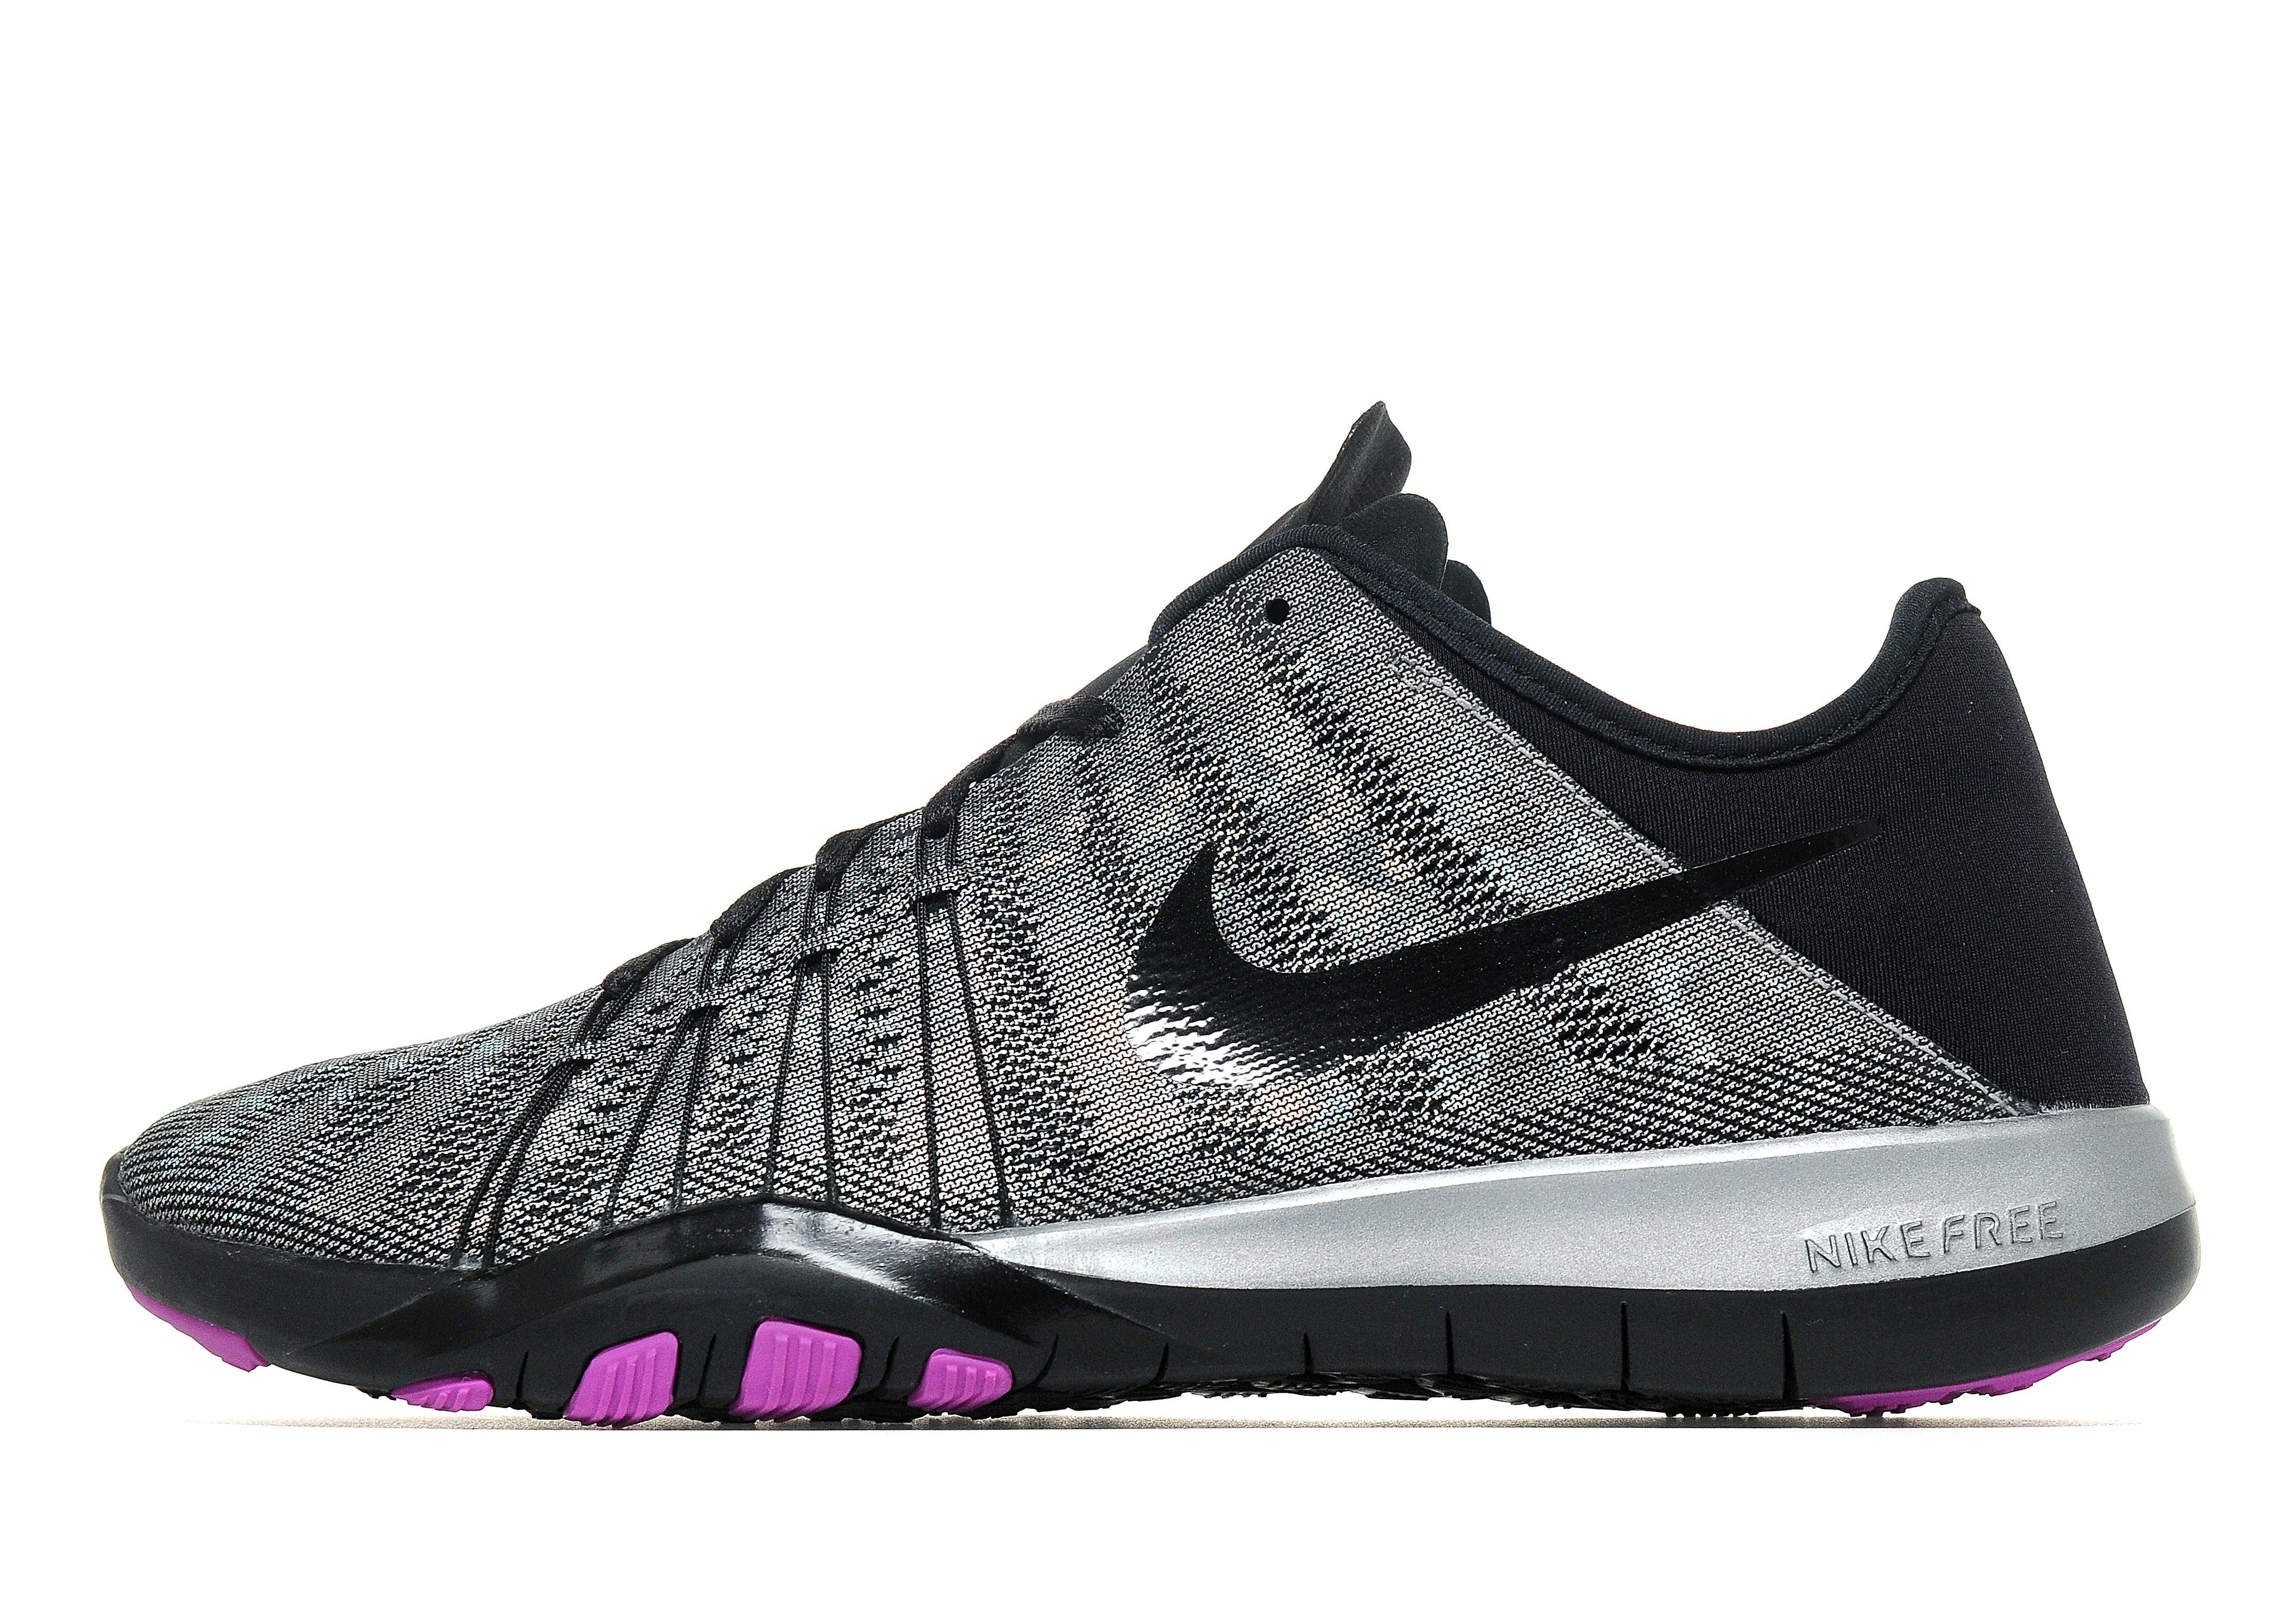 Nike Free TR 6 Metallic Women's